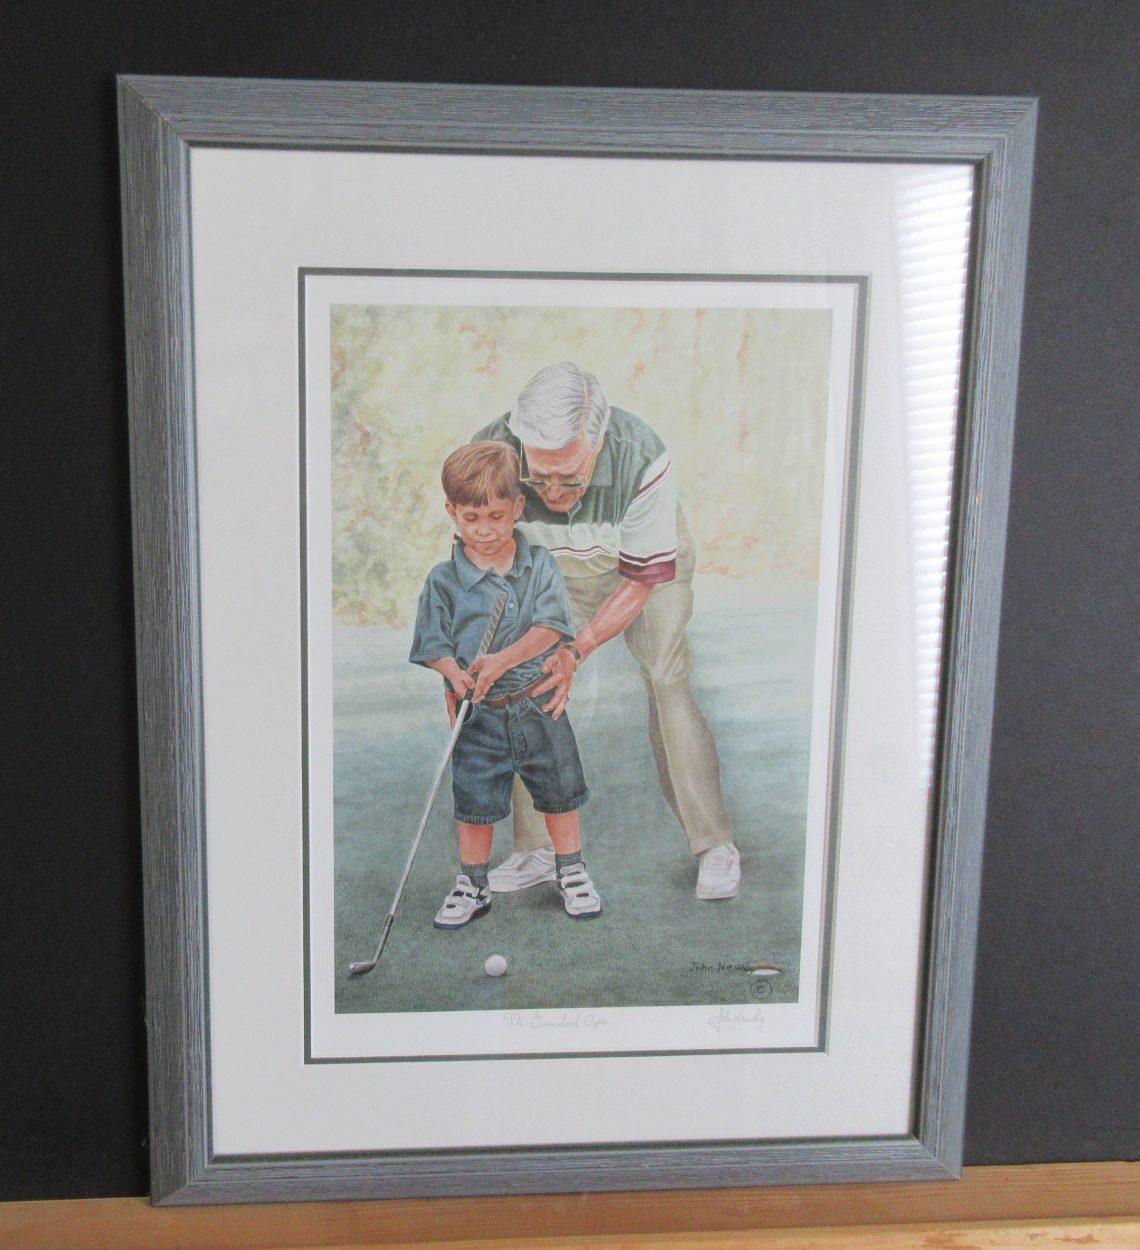 The Granddad Open